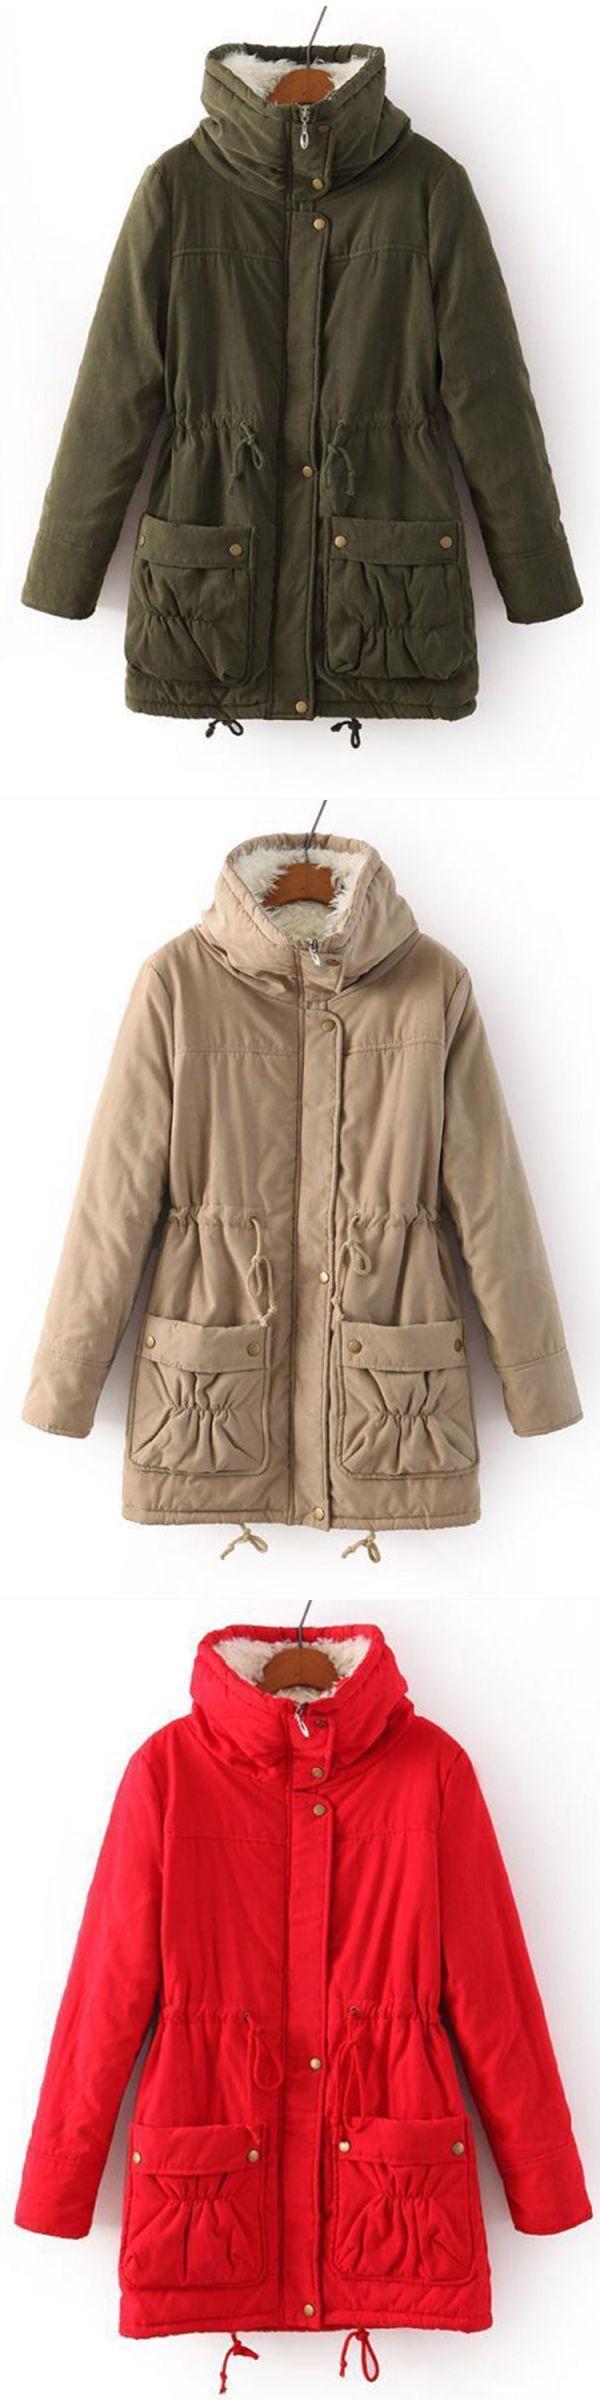 Casual loose solid color drawstring waist thicken hooded women coats k9 coats #coats #and #clark #coats #hand #quilting #thread #g #star #coats #r #c #boats